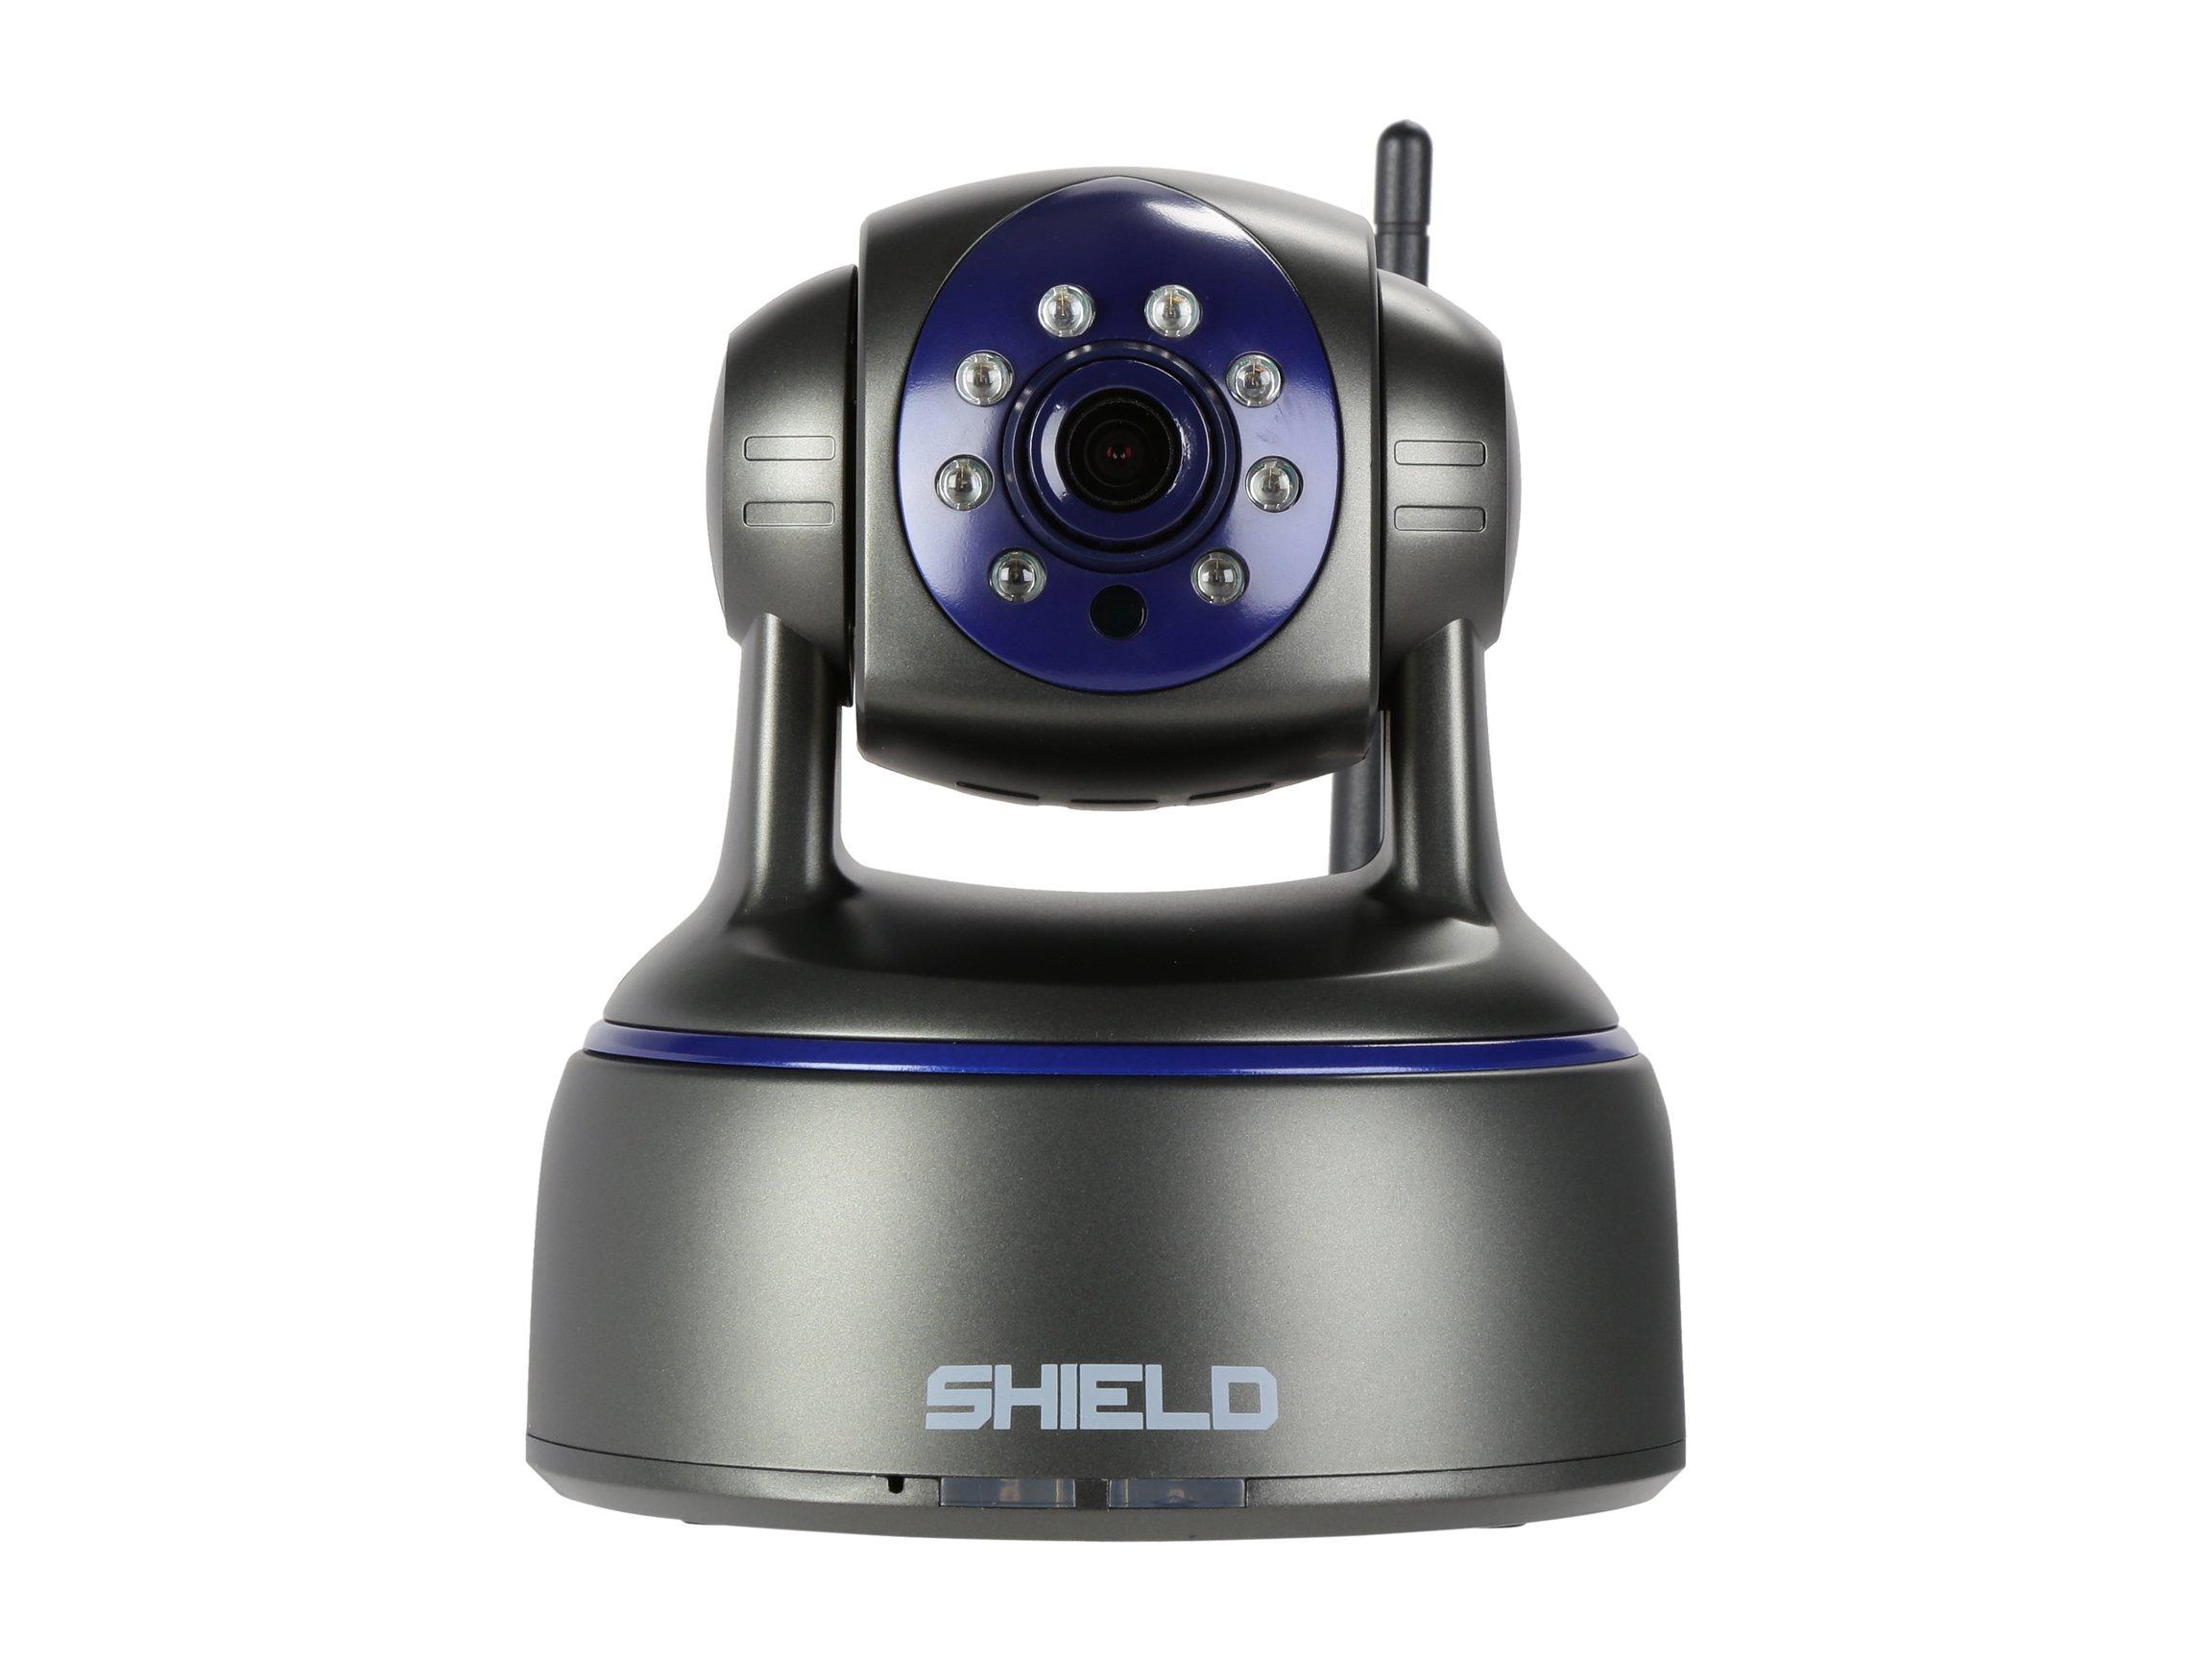 SHIELDeye HD Surveillance Security Camera, 1080P WiFi & Wireless IP Camera, Night Vision, Pan & Tilt, 2 Way Audio and Remove Viewing for Pet / Baby / Elder / Nanny Monitors, Free App download-Black